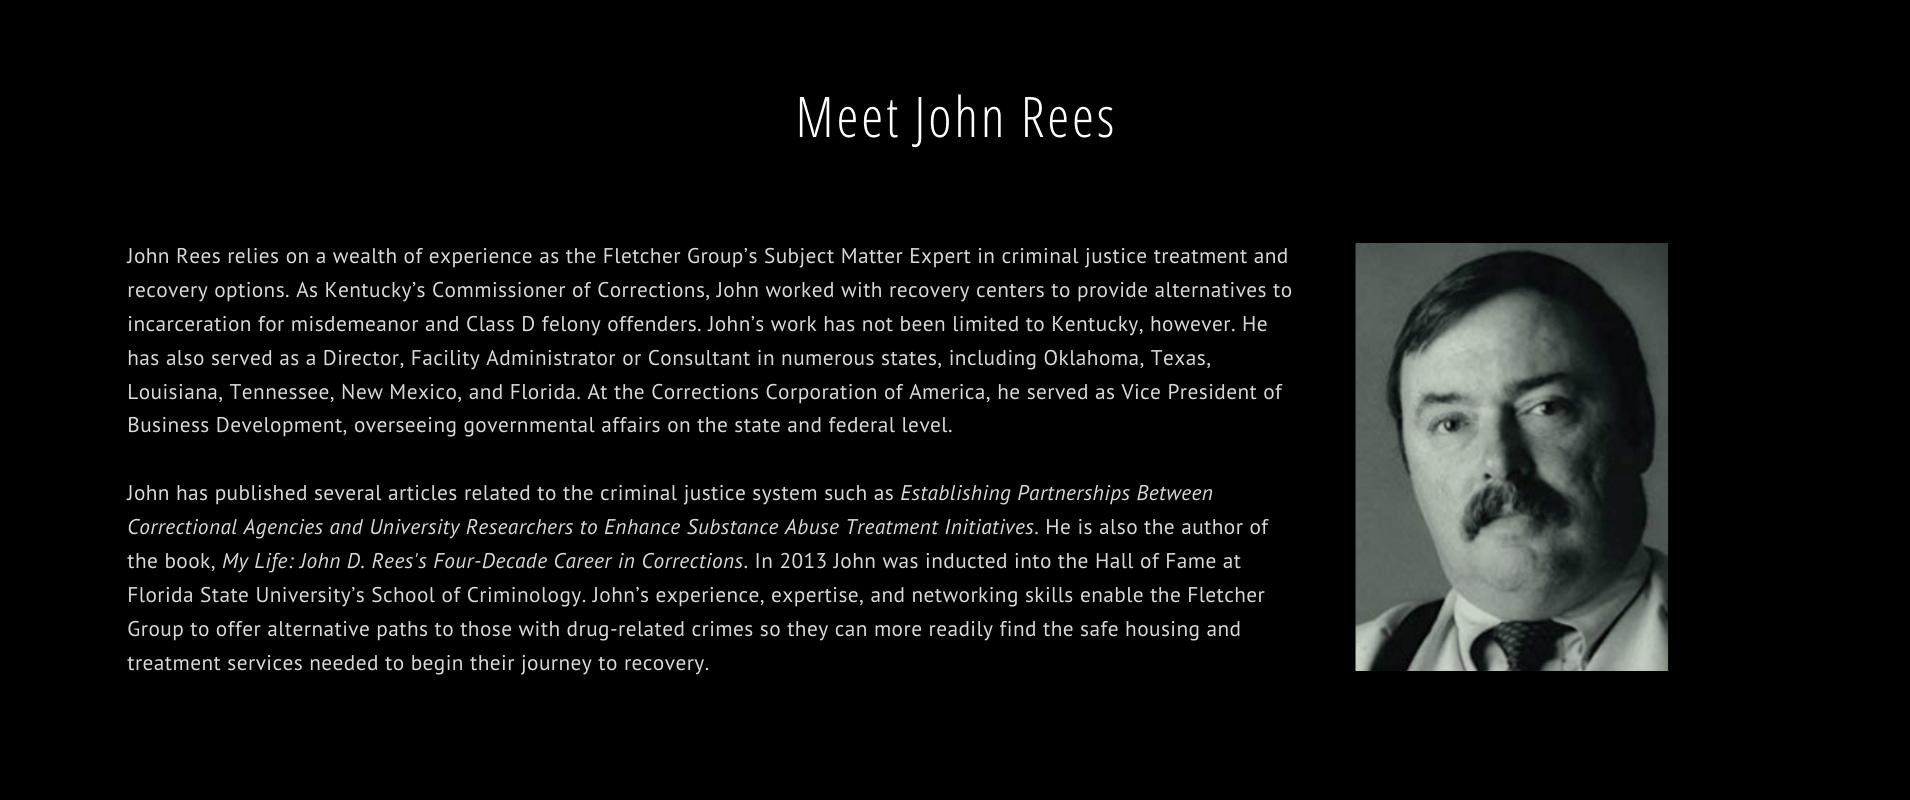 MEET JOHN REES